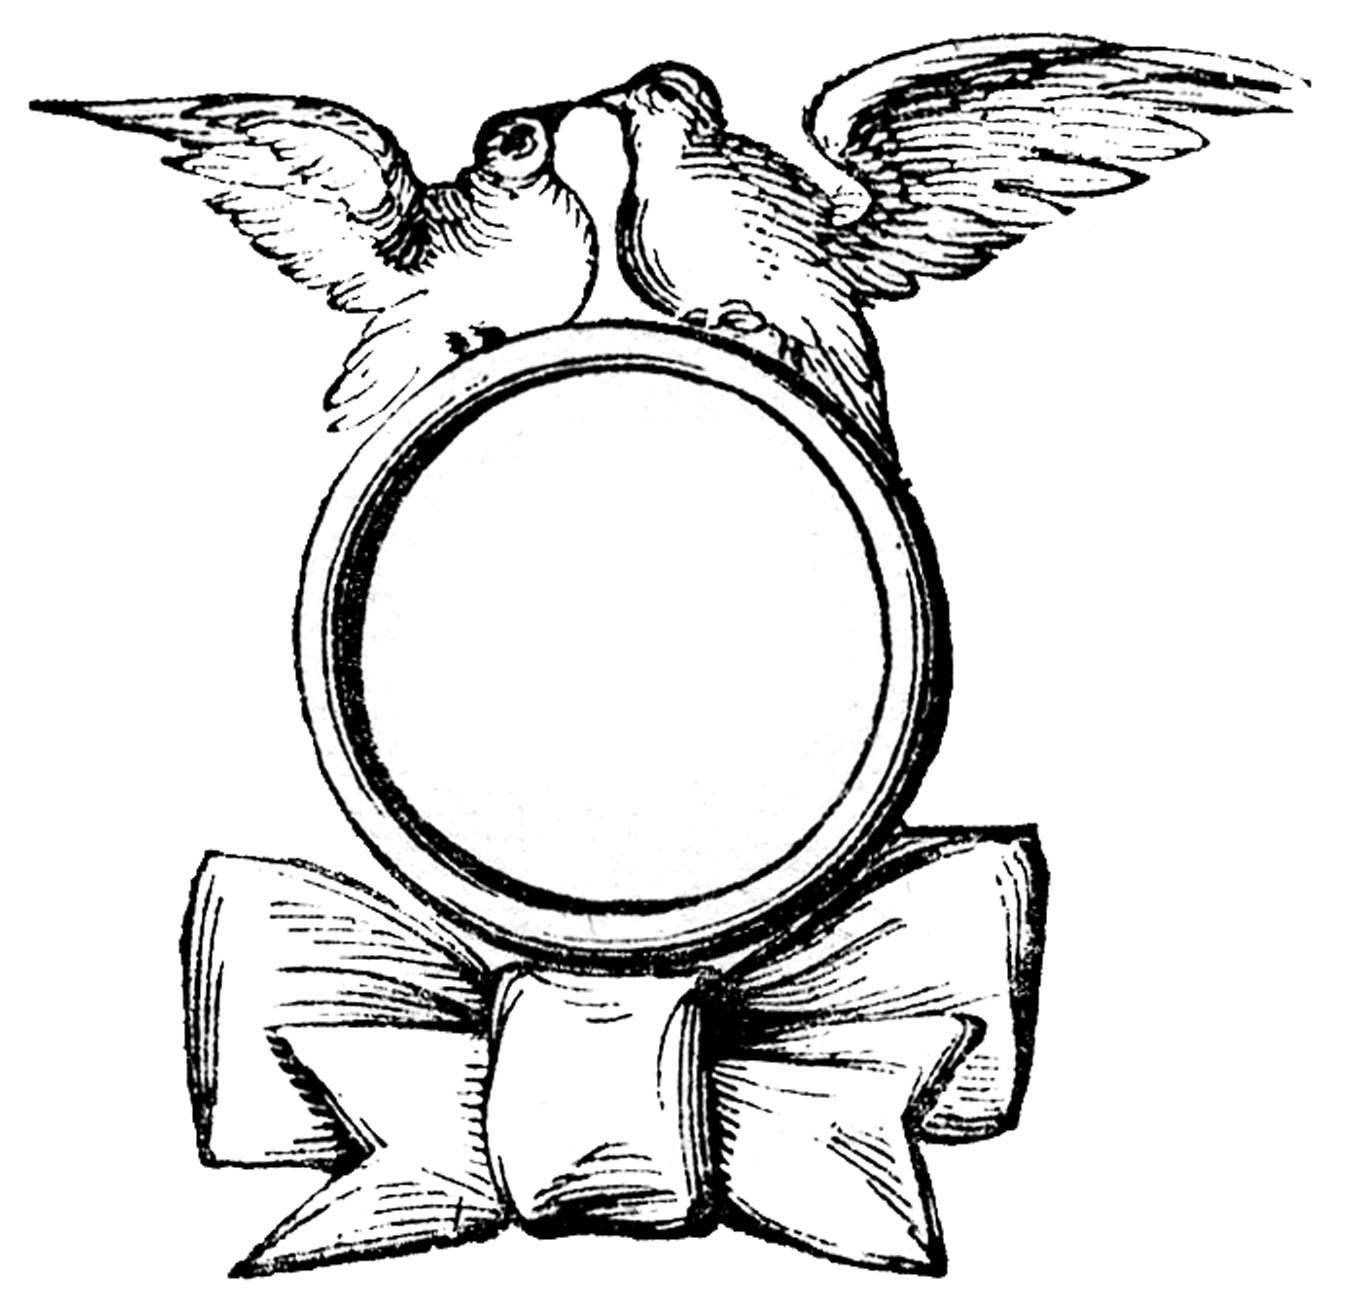 Drawn ring wedding free. Bride clipart logo